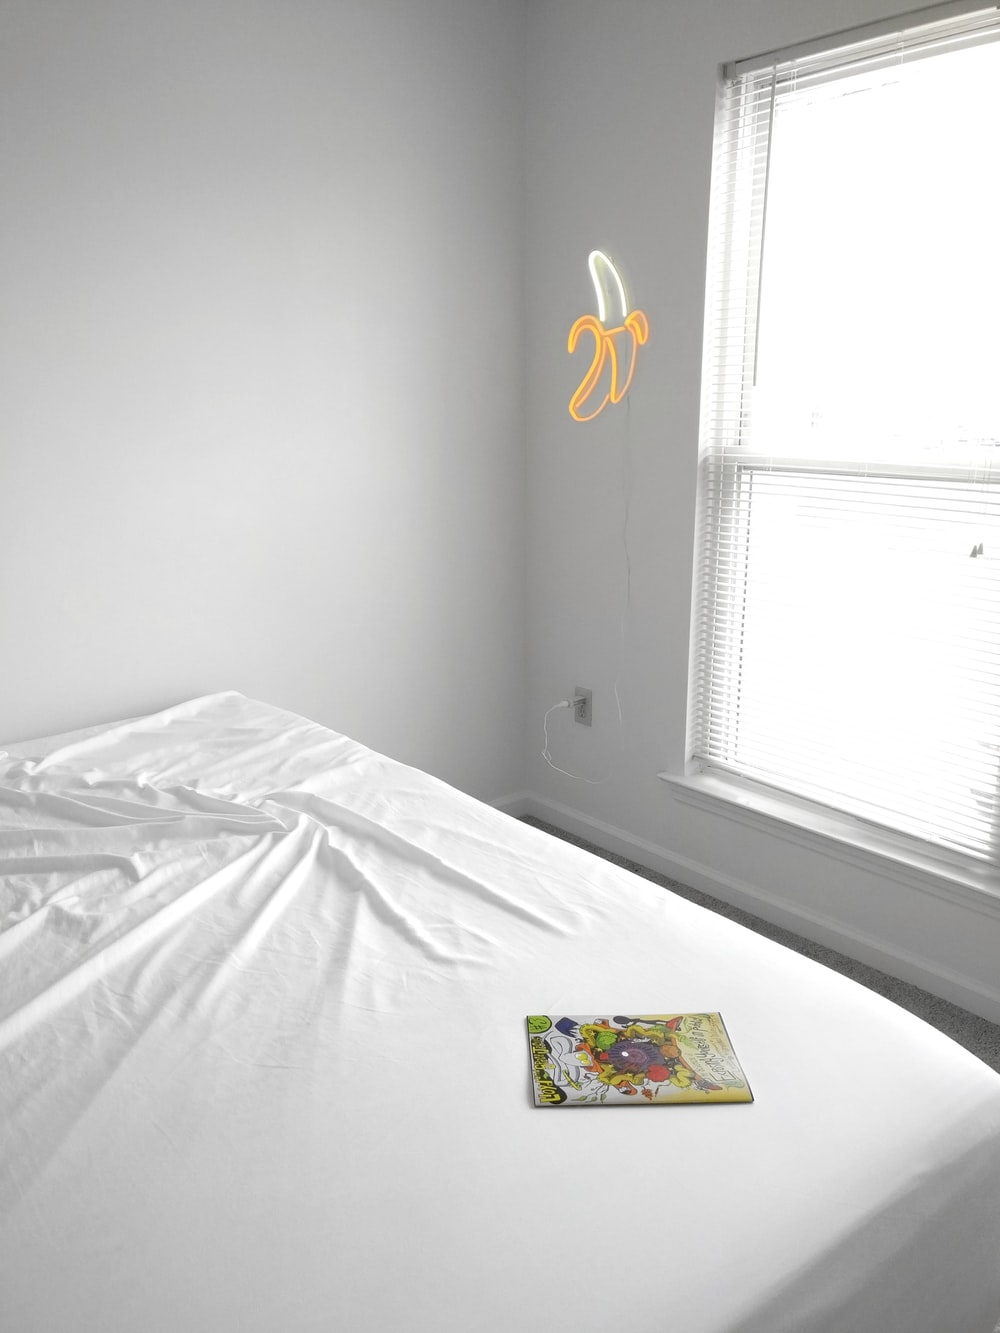 white bed comforter near window